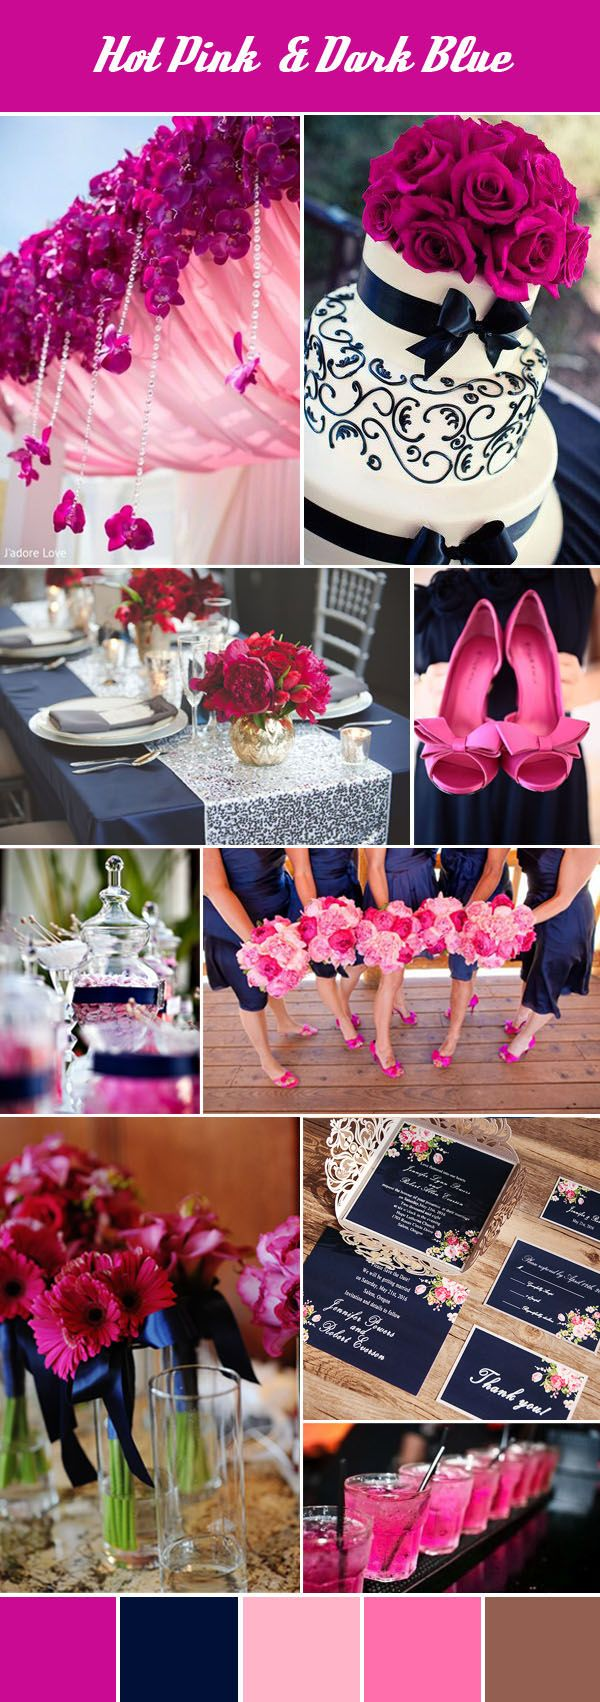 Pre wedding party table decorations february 2019  best Destination Wedding  images on Pinterest  Decor wedding